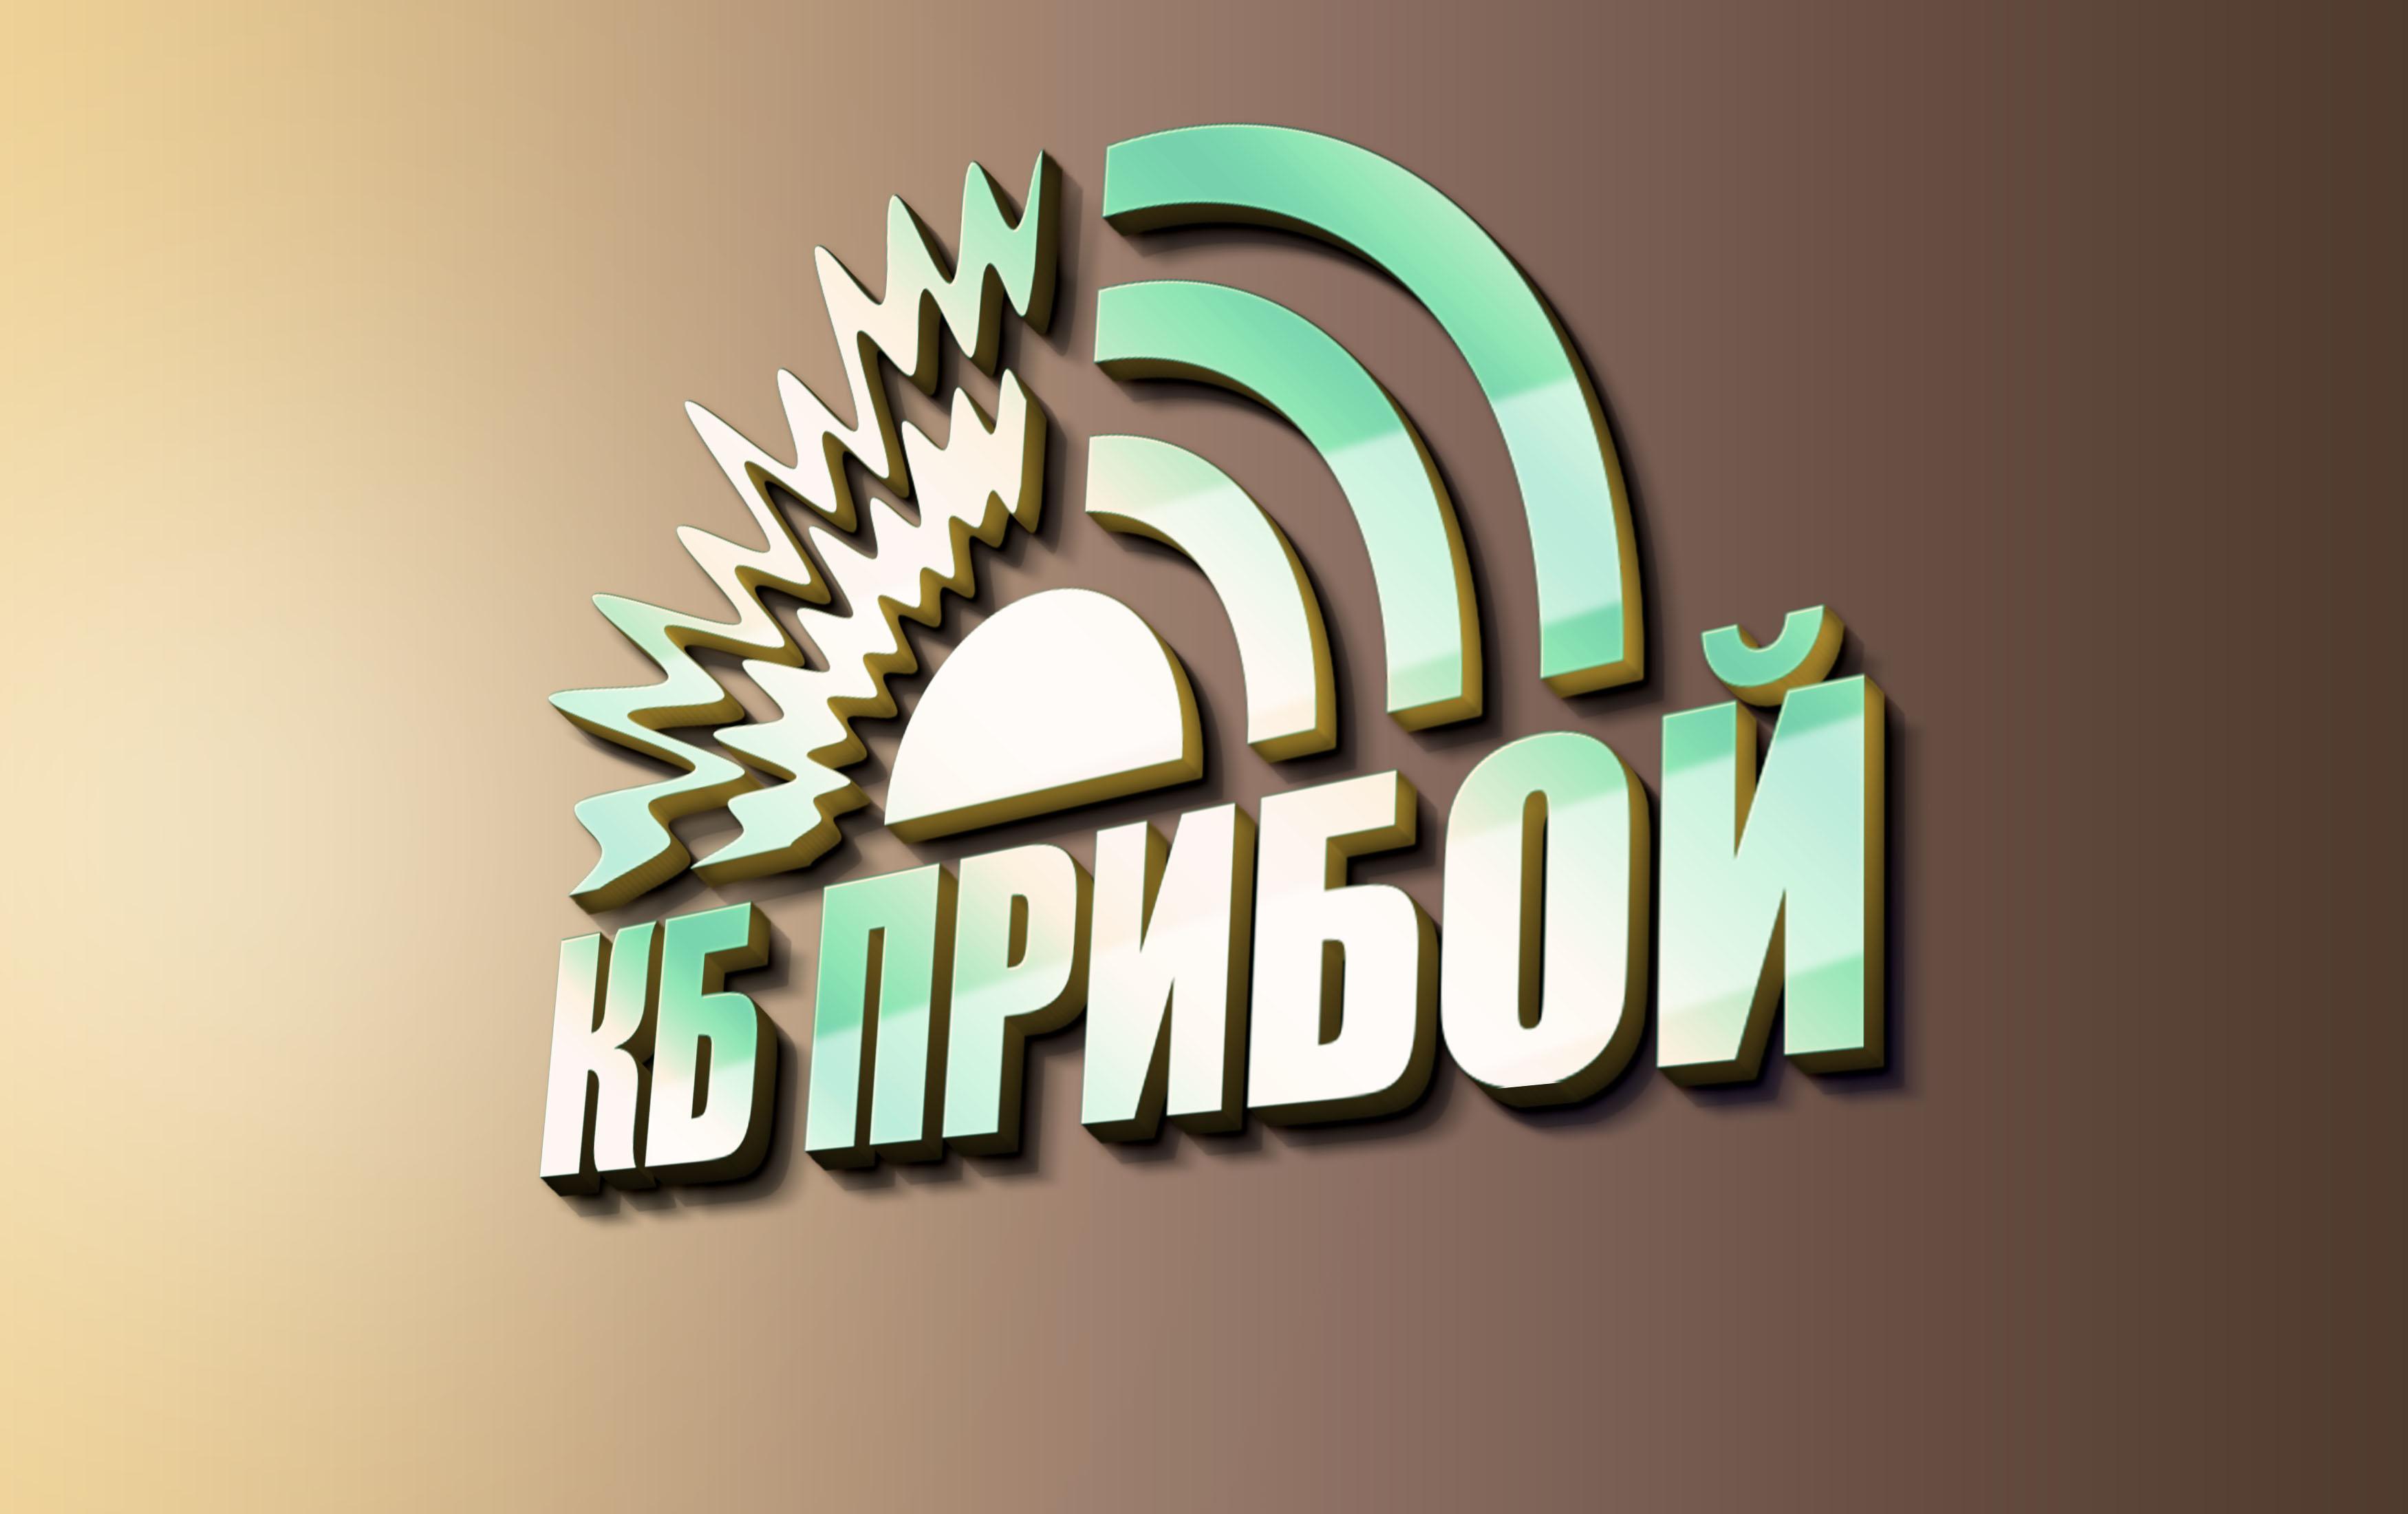 Разработка логотипа и фирменного стиля для КБ Прибой фото f_0985b24088aedf60.jpg